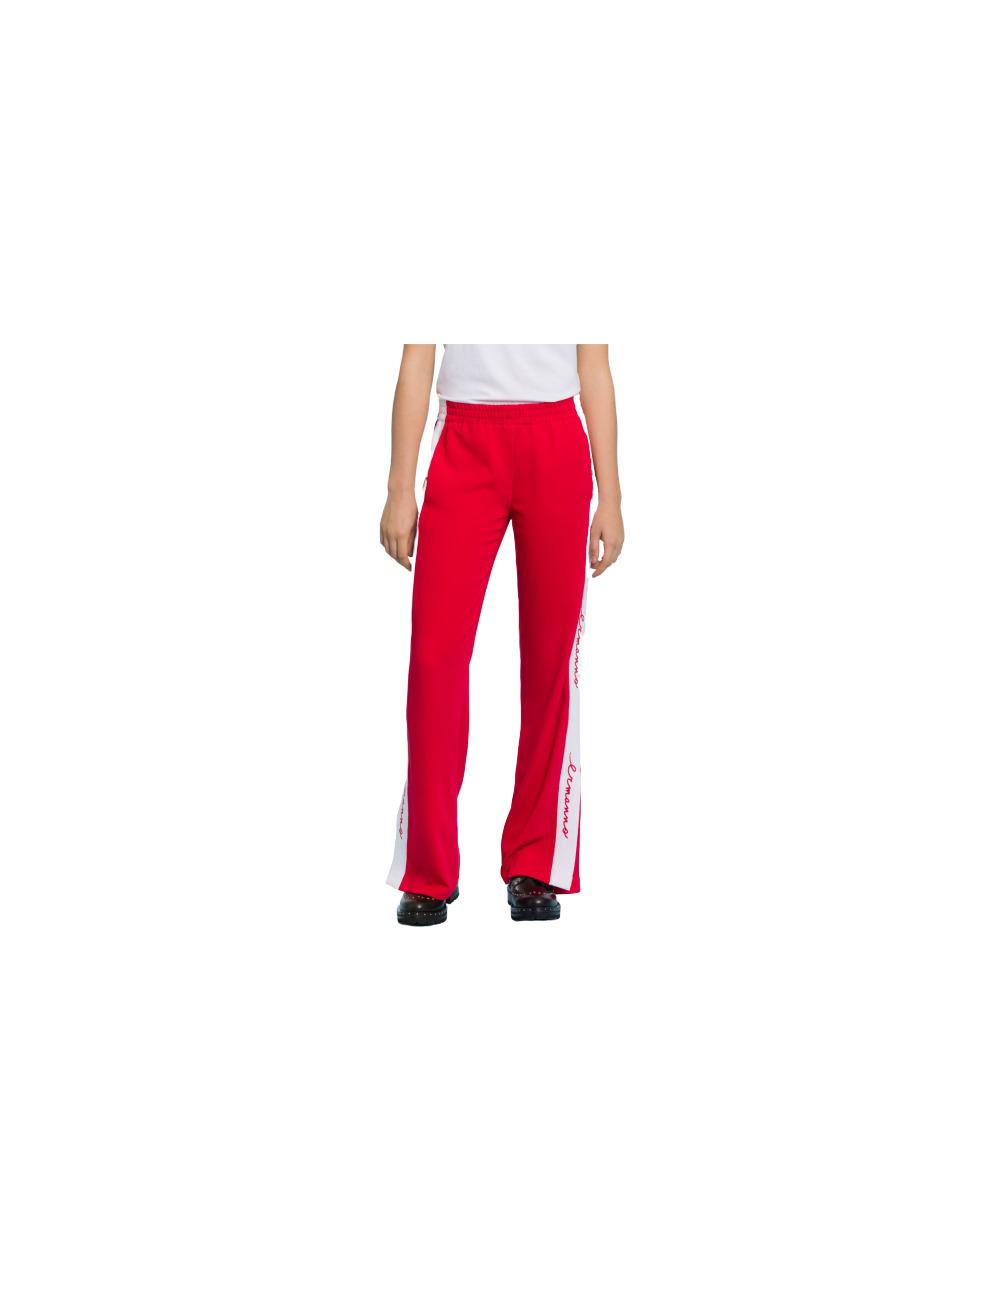 Pantalon en cady Ermanno Scervino - BIG BOSS MEGEVE